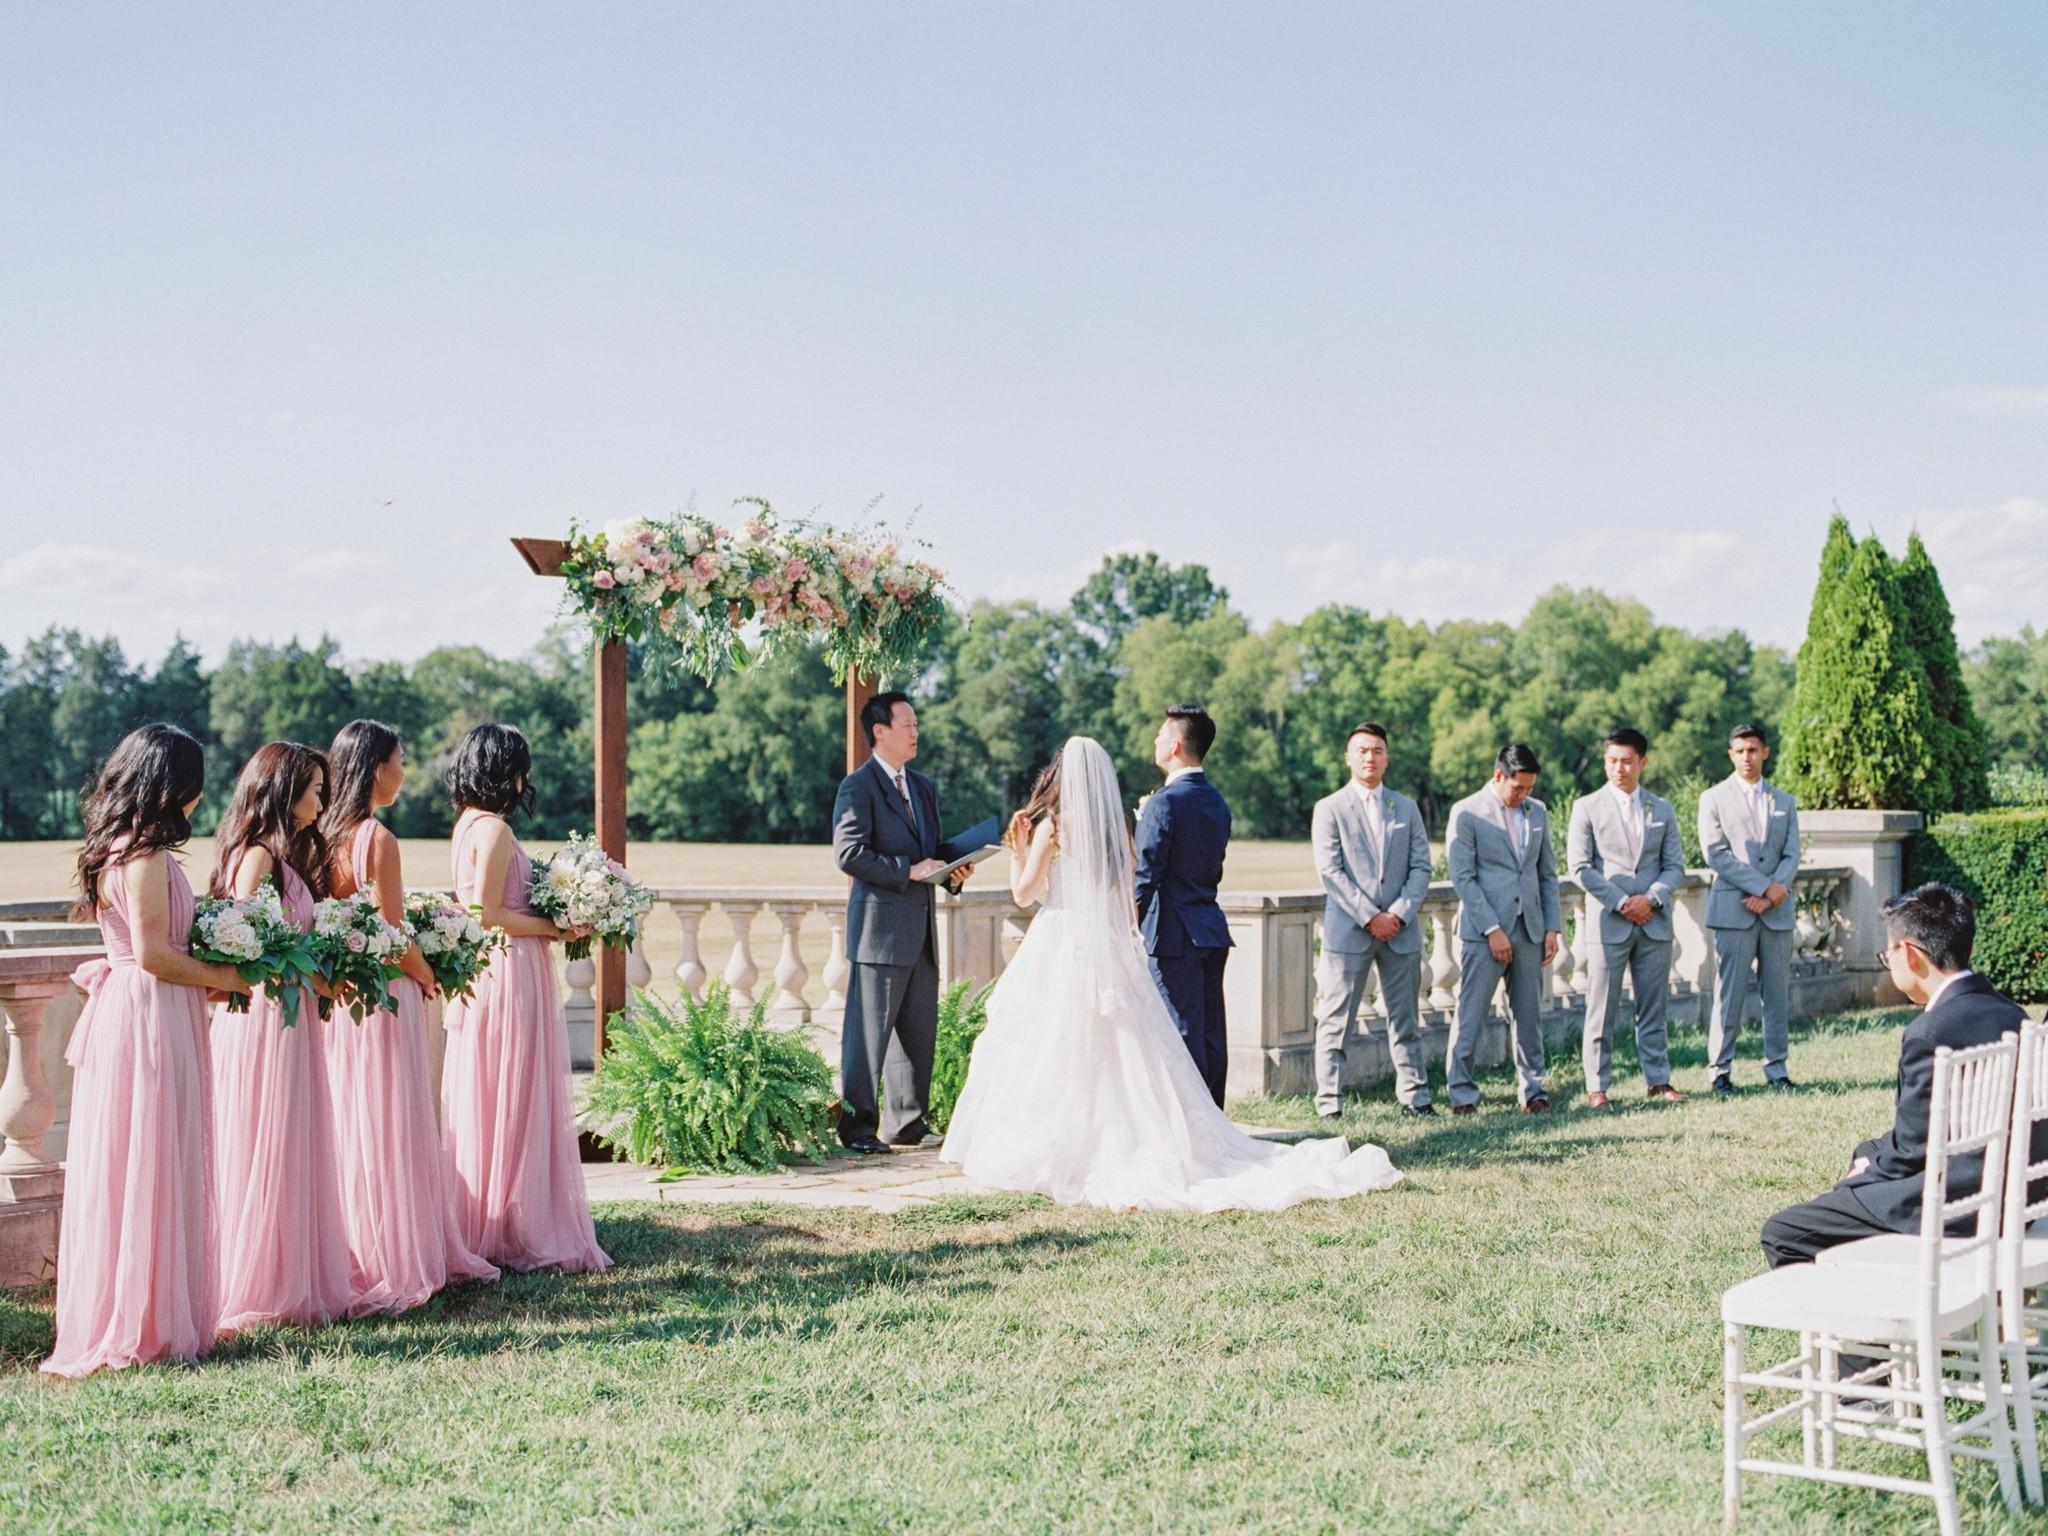 VA-Great-Marsh-Estate-Summer-Wedding-Blush-57.jpg